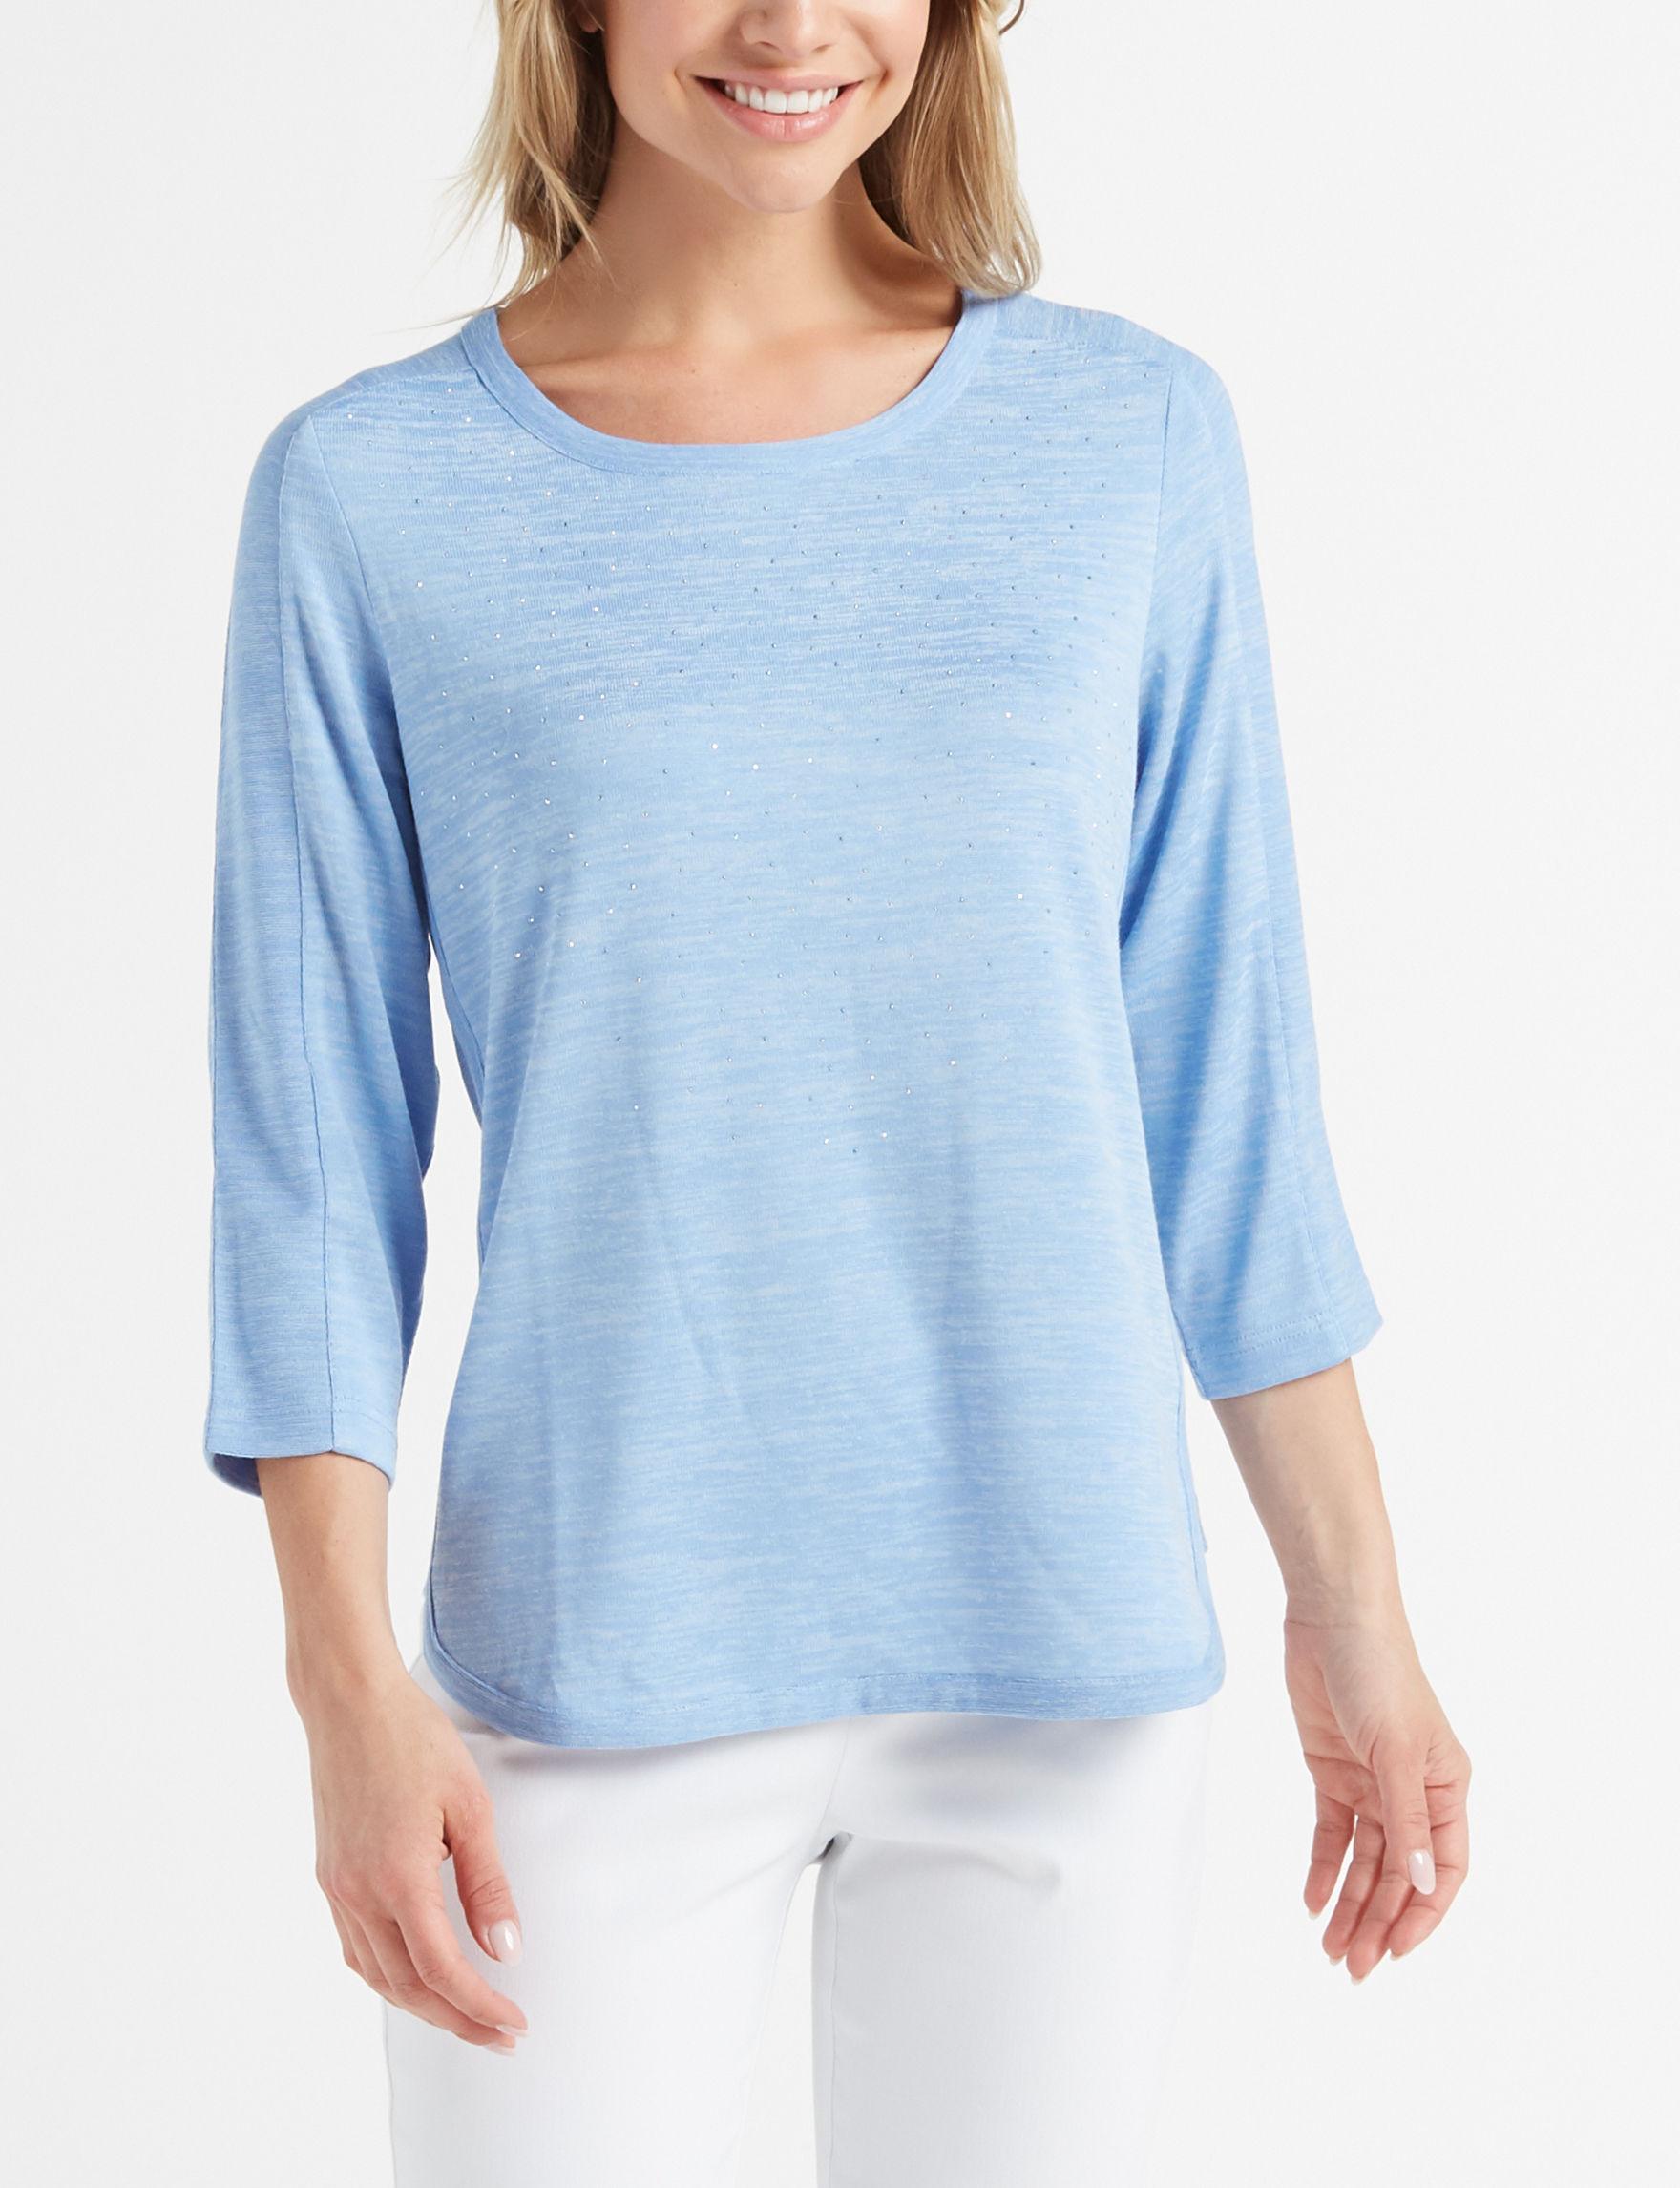 Cathy Daniels Light Blue Shirts & Blouses